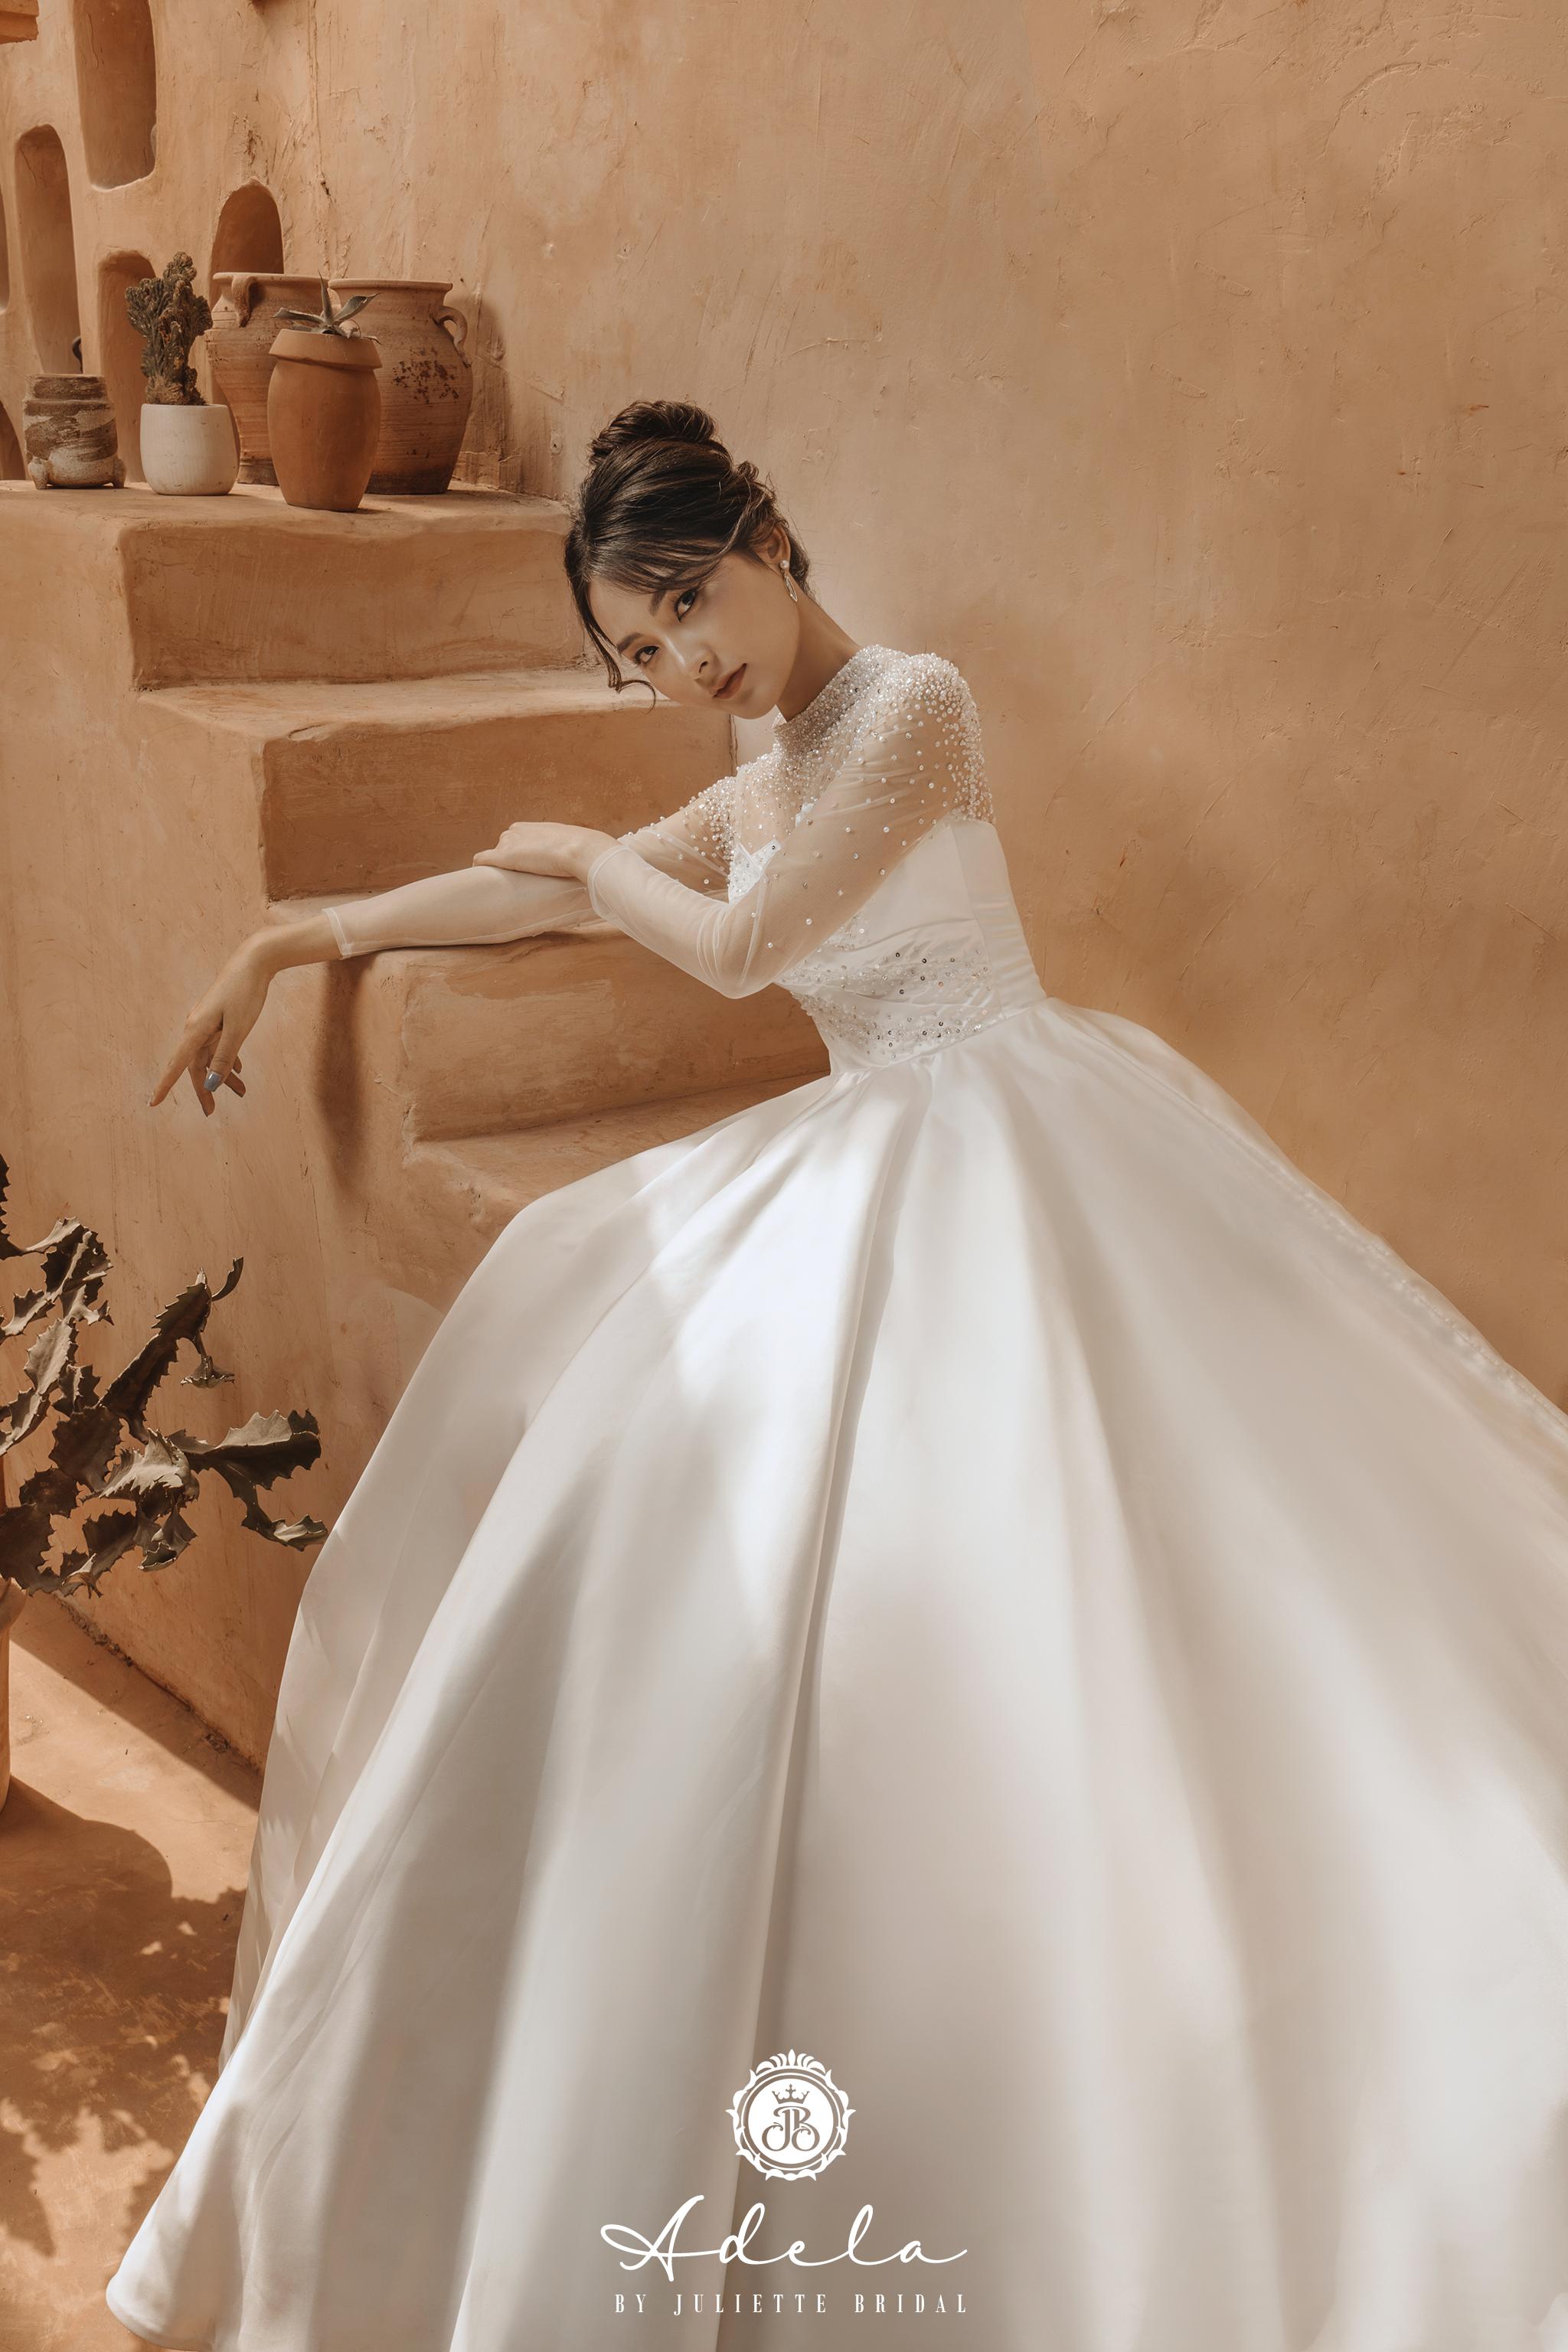 BST Adela (Adela Collection) | Top các mẫu váy cưới đơn giản 2021 11